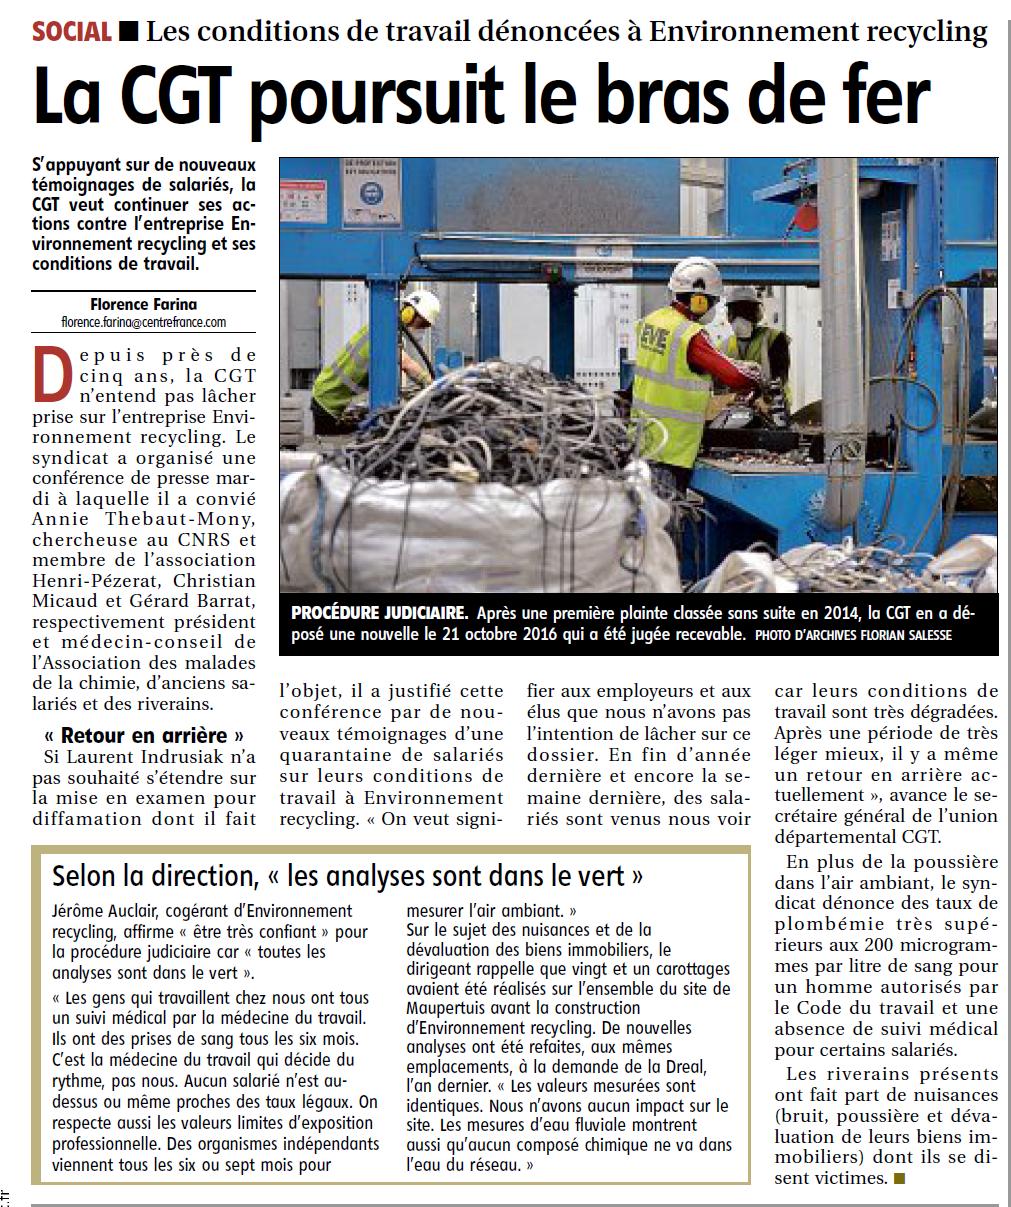 Article du 31.03.2017 Environnement Recycling (002)